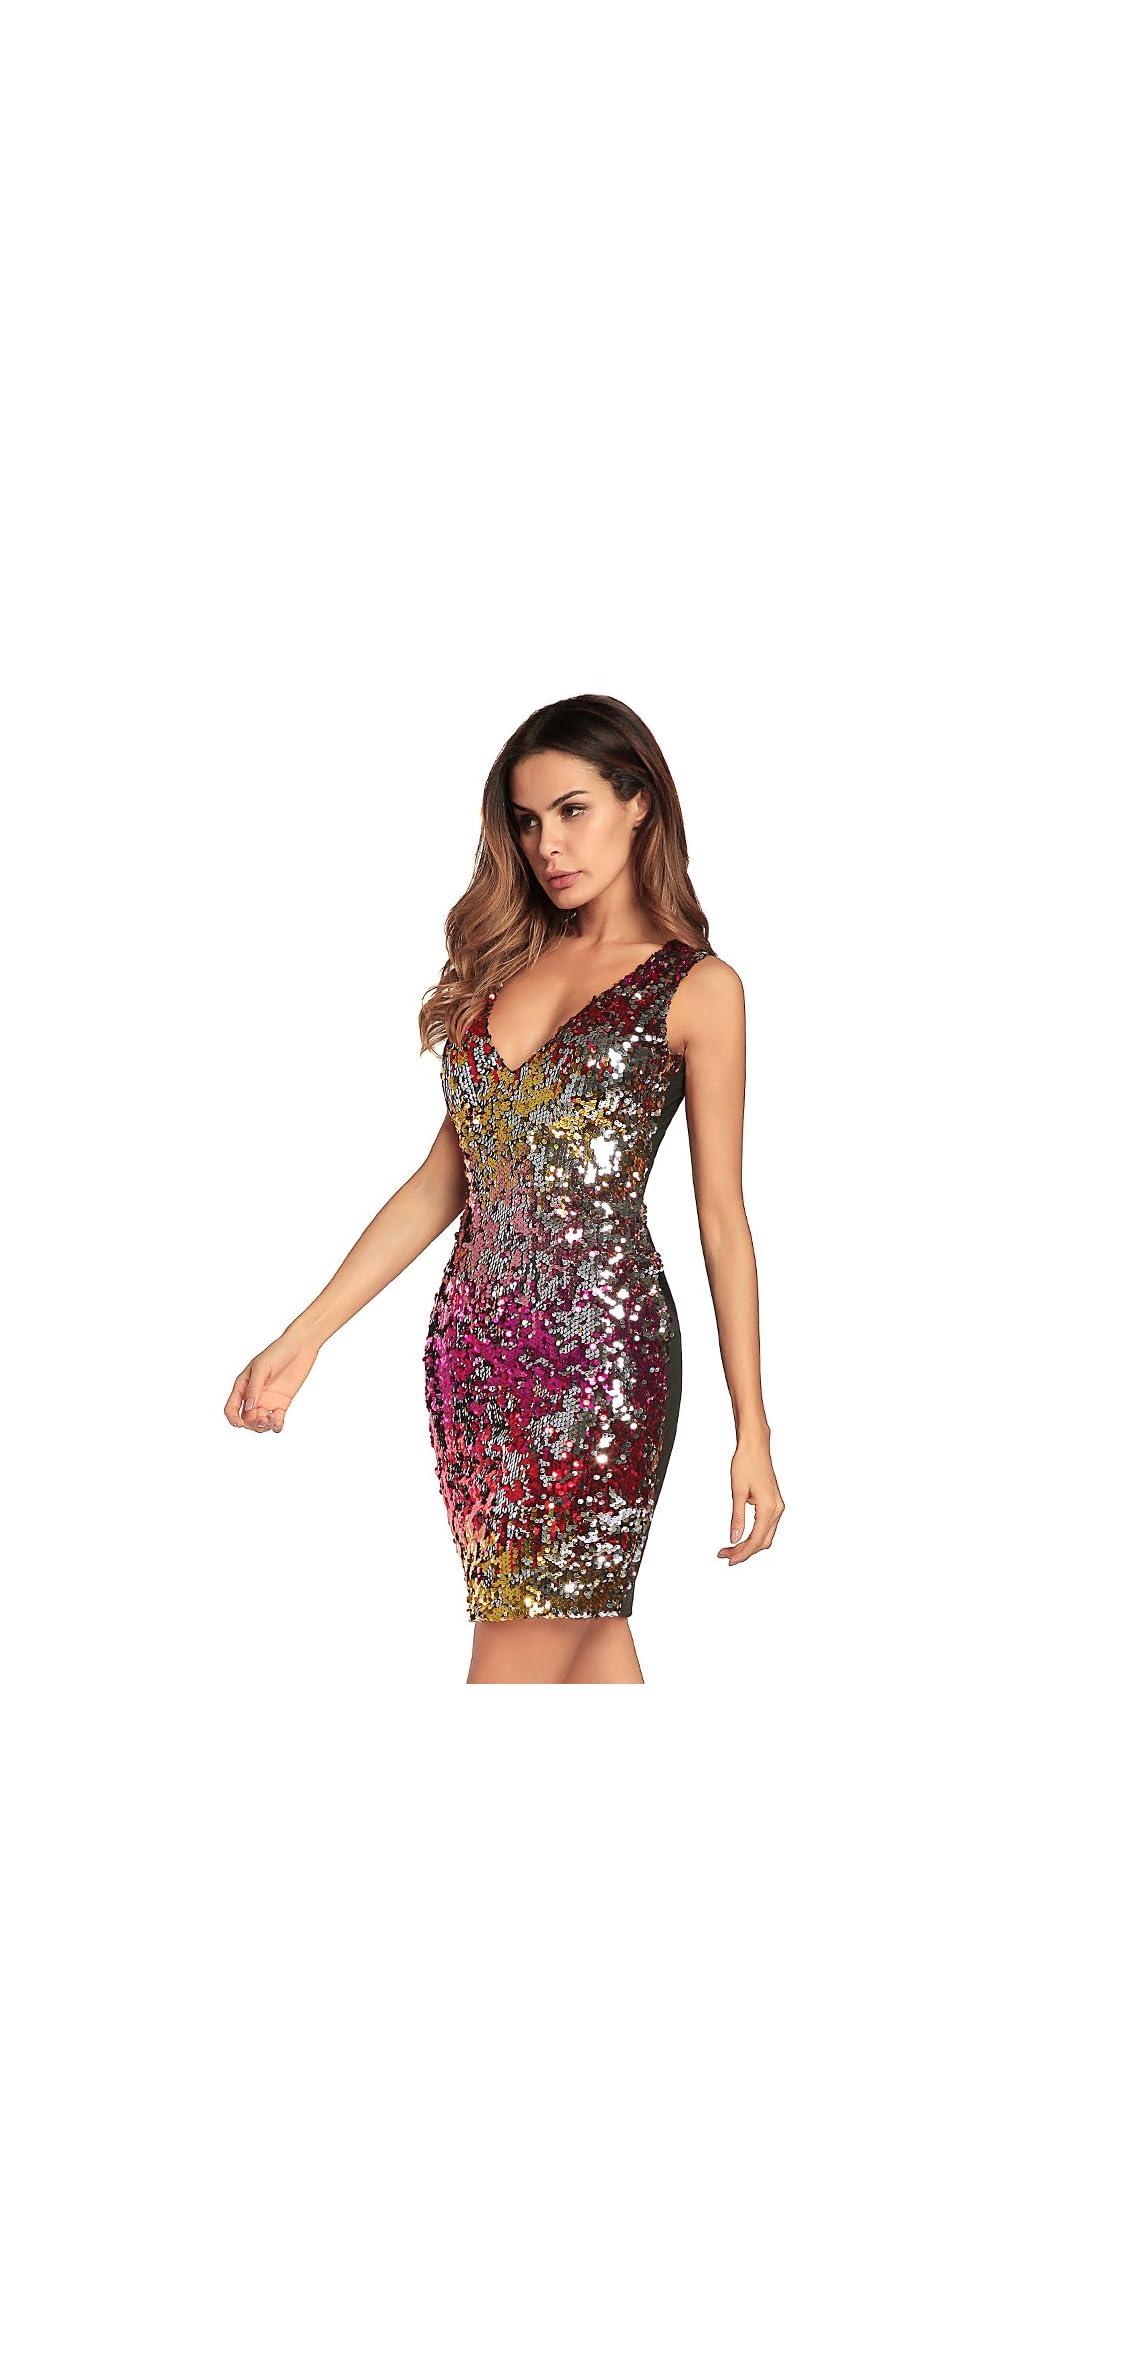 Women Sexy V-neck Bodycon Dress Sparkly Sequin Cocktail